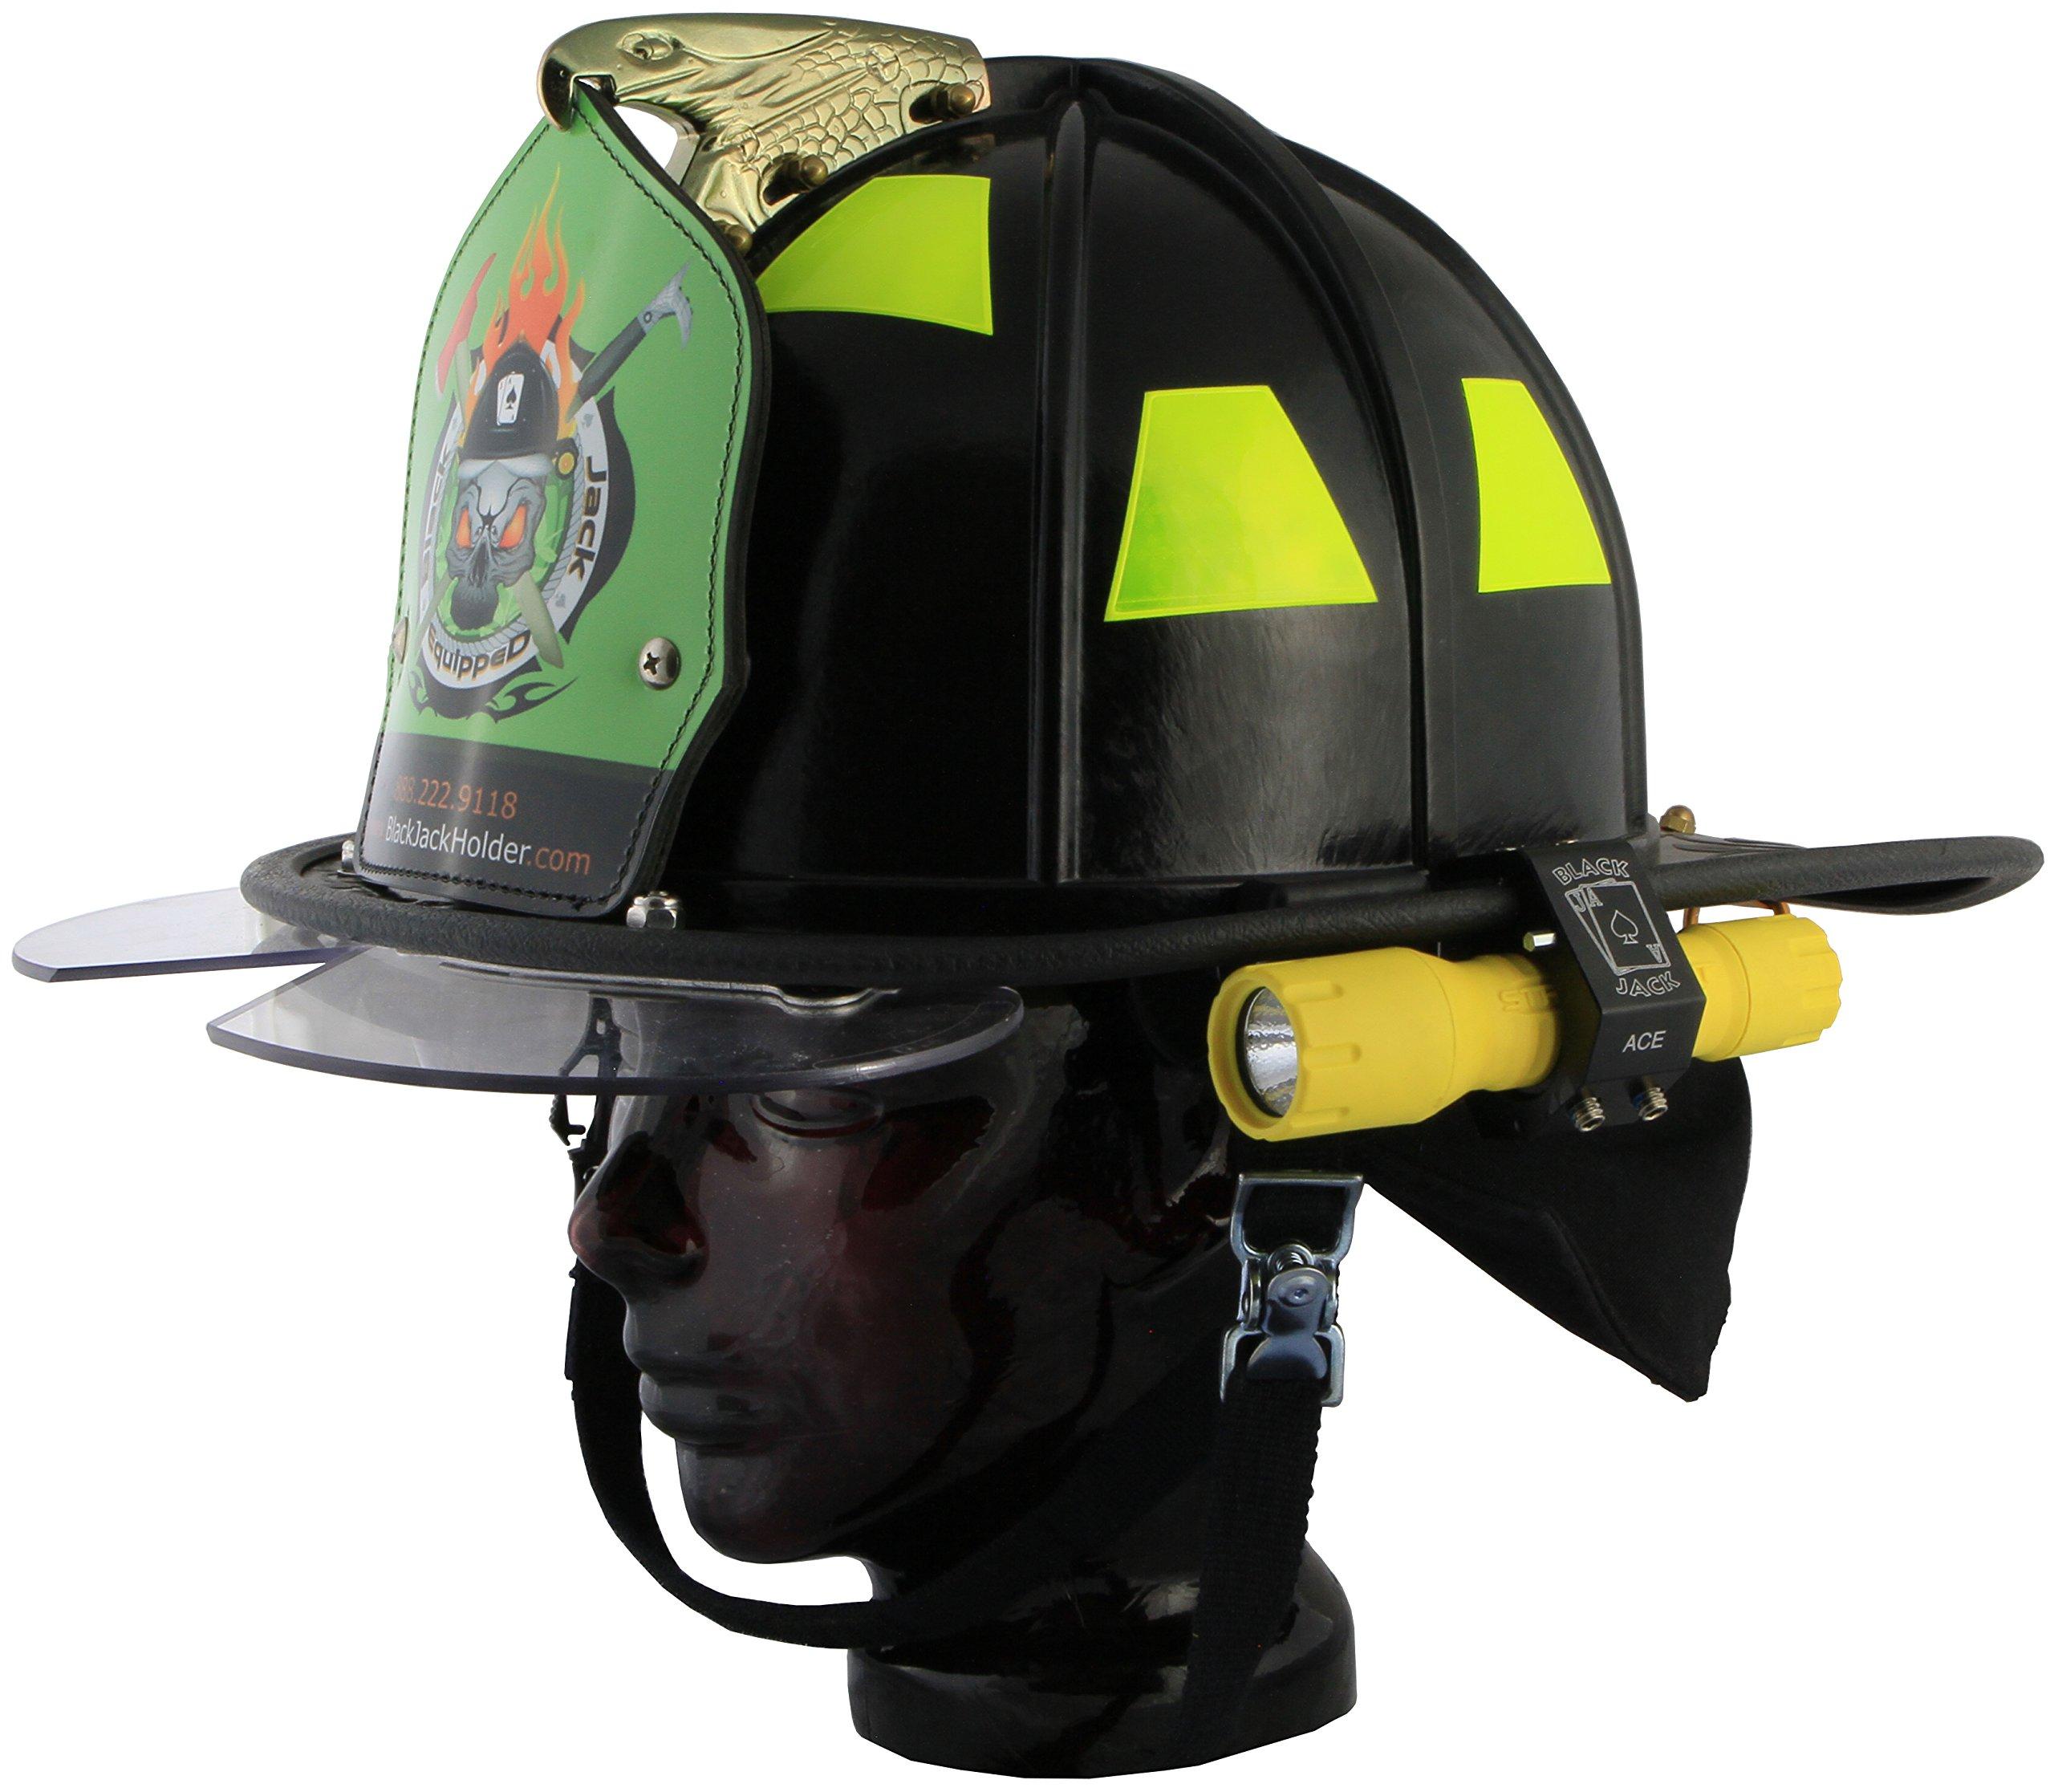 Blackjack ACE Firefighter Helmet Aluminum Flashlight Holder by Blackjack Fire & Safety (Image #6)